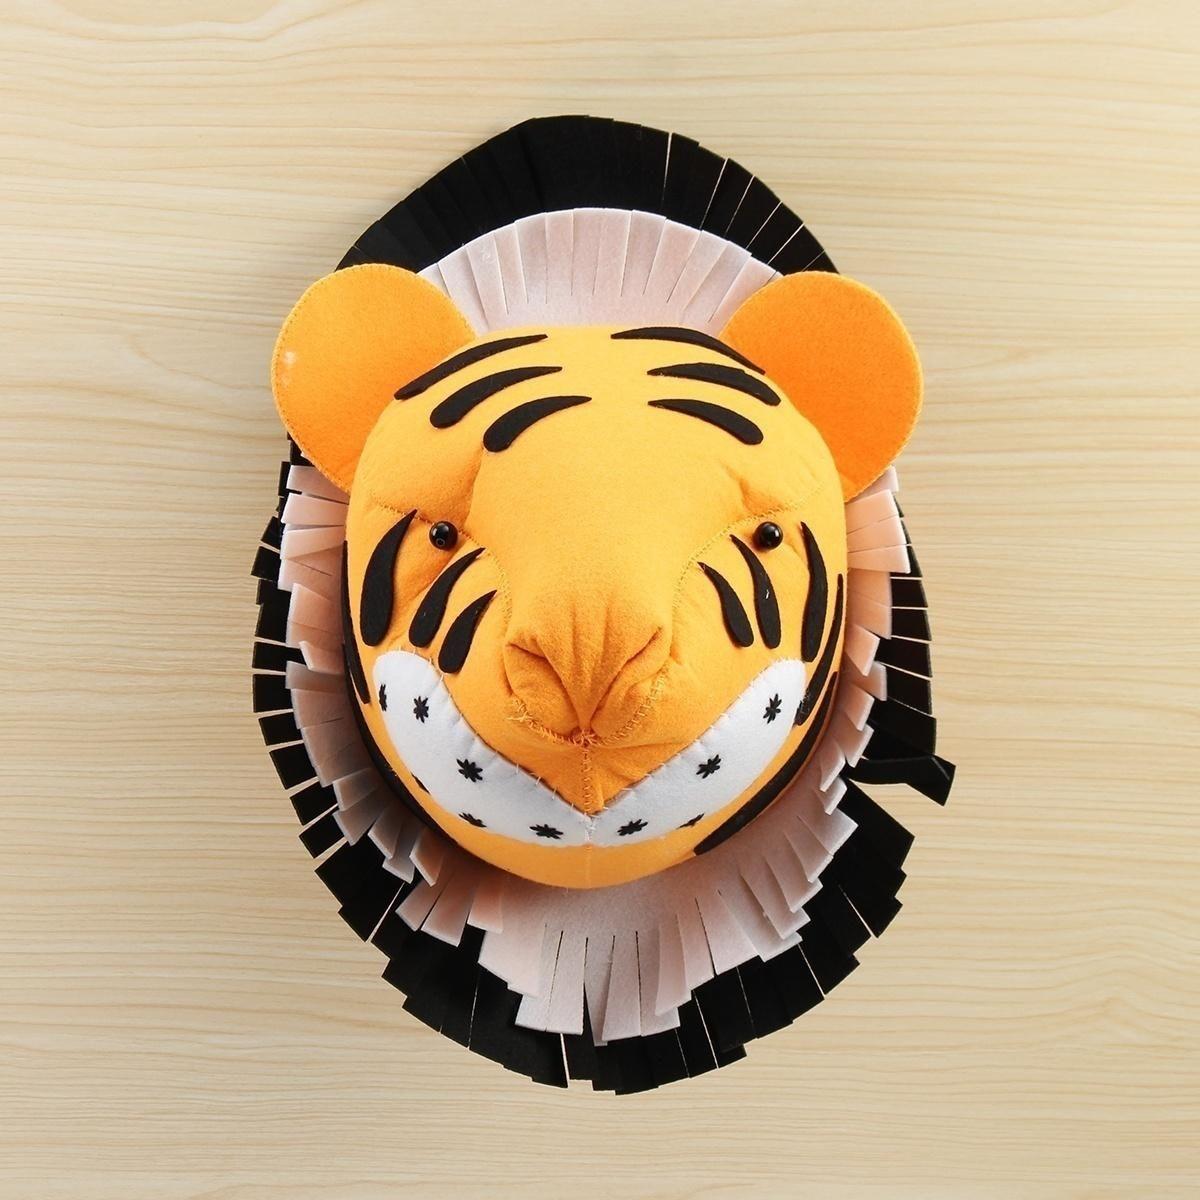 Tiger 3D Felt Animal Head Wall Room Birthday Party Christmas Artwork Decal Children Room Nursery Wall Decorations